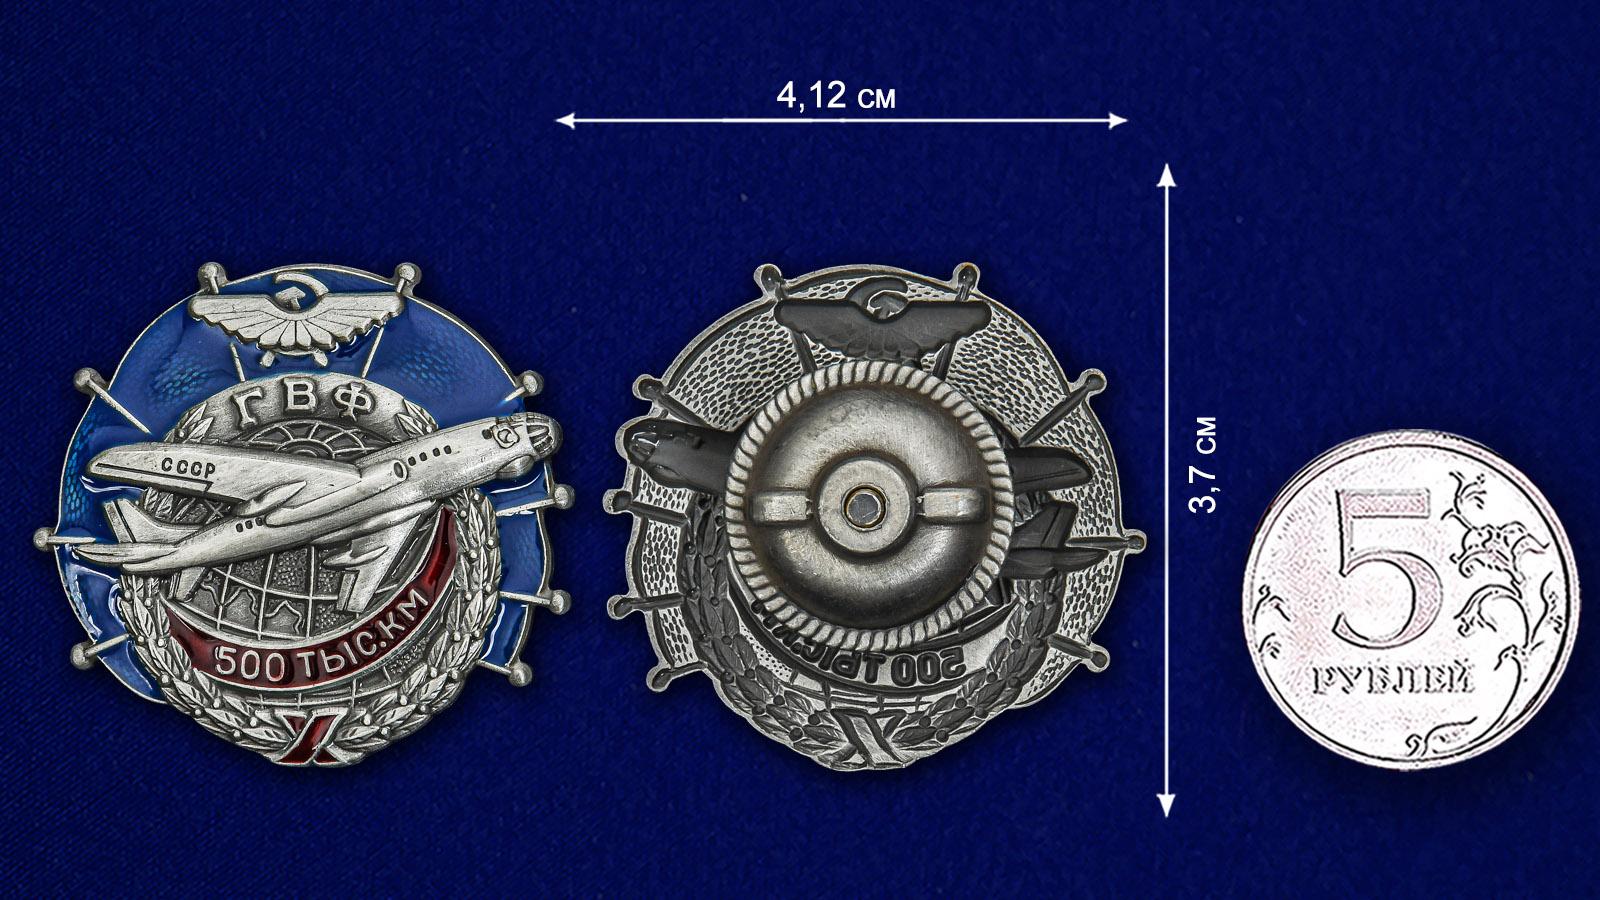 Знак ГВФ ТУ-104 За налет 500 тыс. км (серебро) - размер